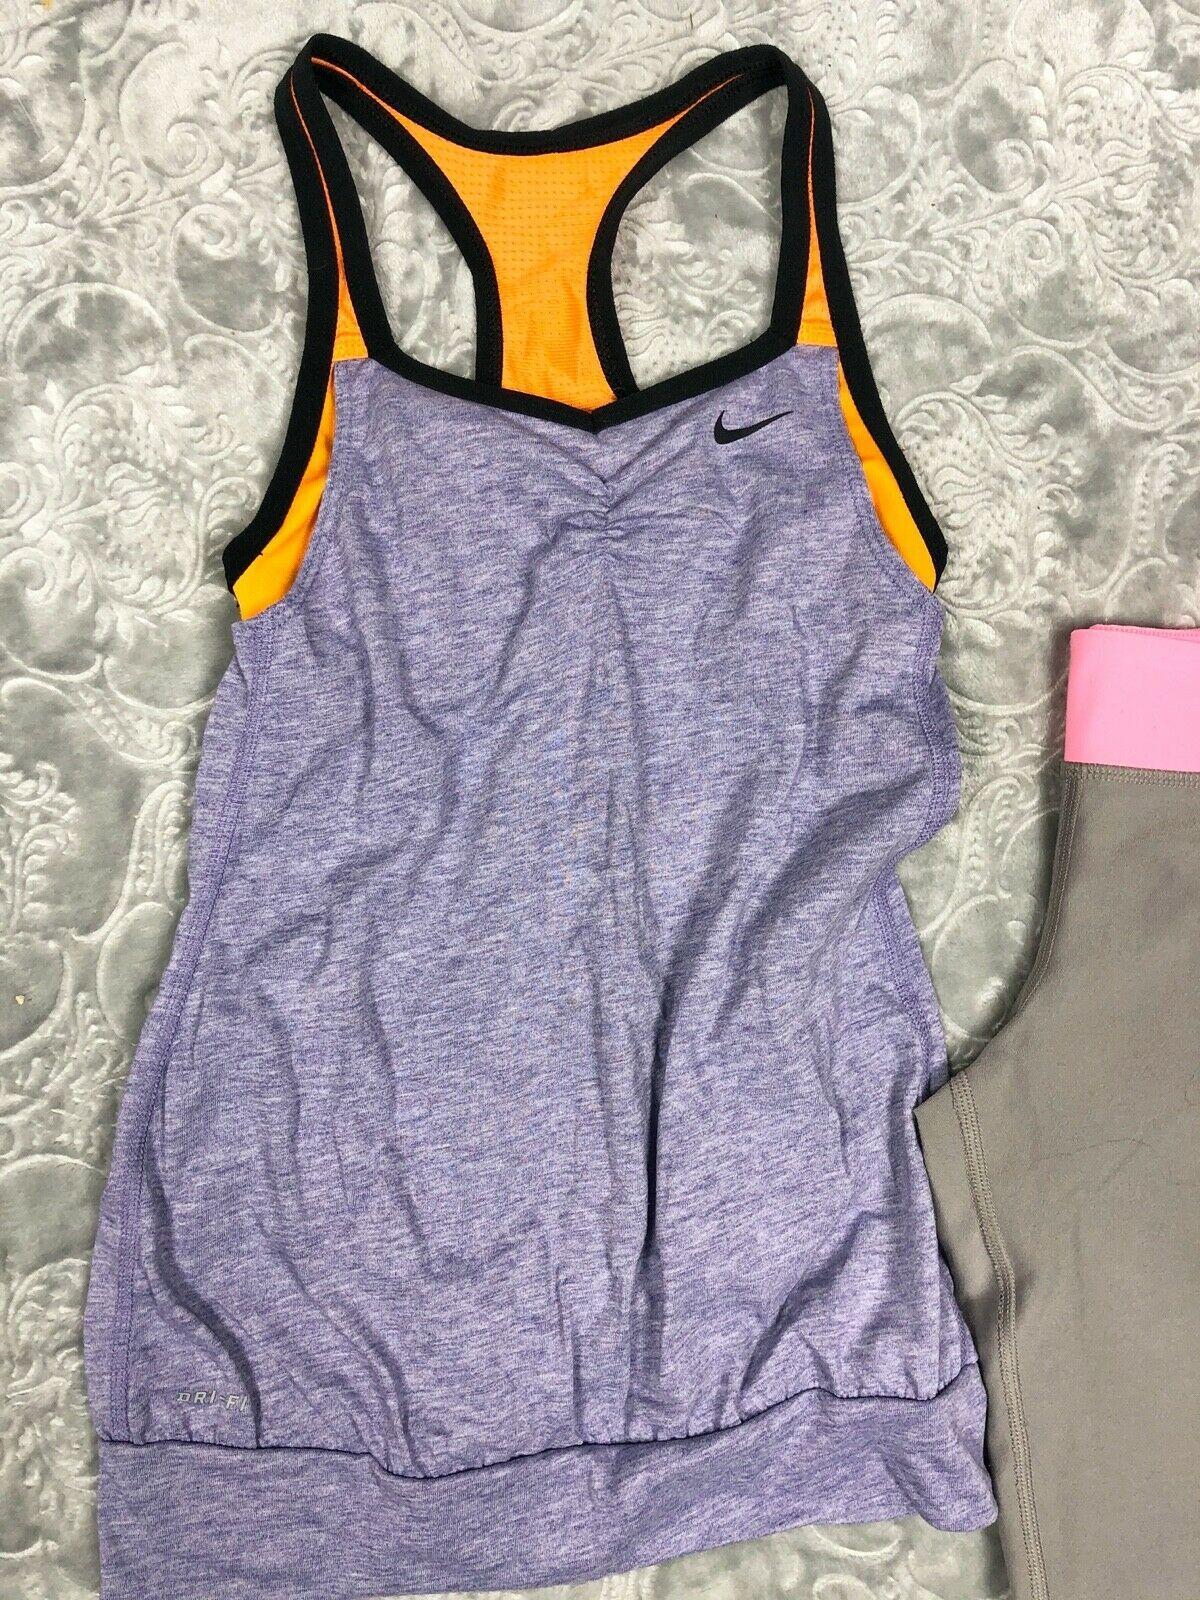 NIKE TANK TOP + TEMPO RUNNING SHORTS + CAPRI LEGGINGS OUTFIT LOT GIRL'S M image 3